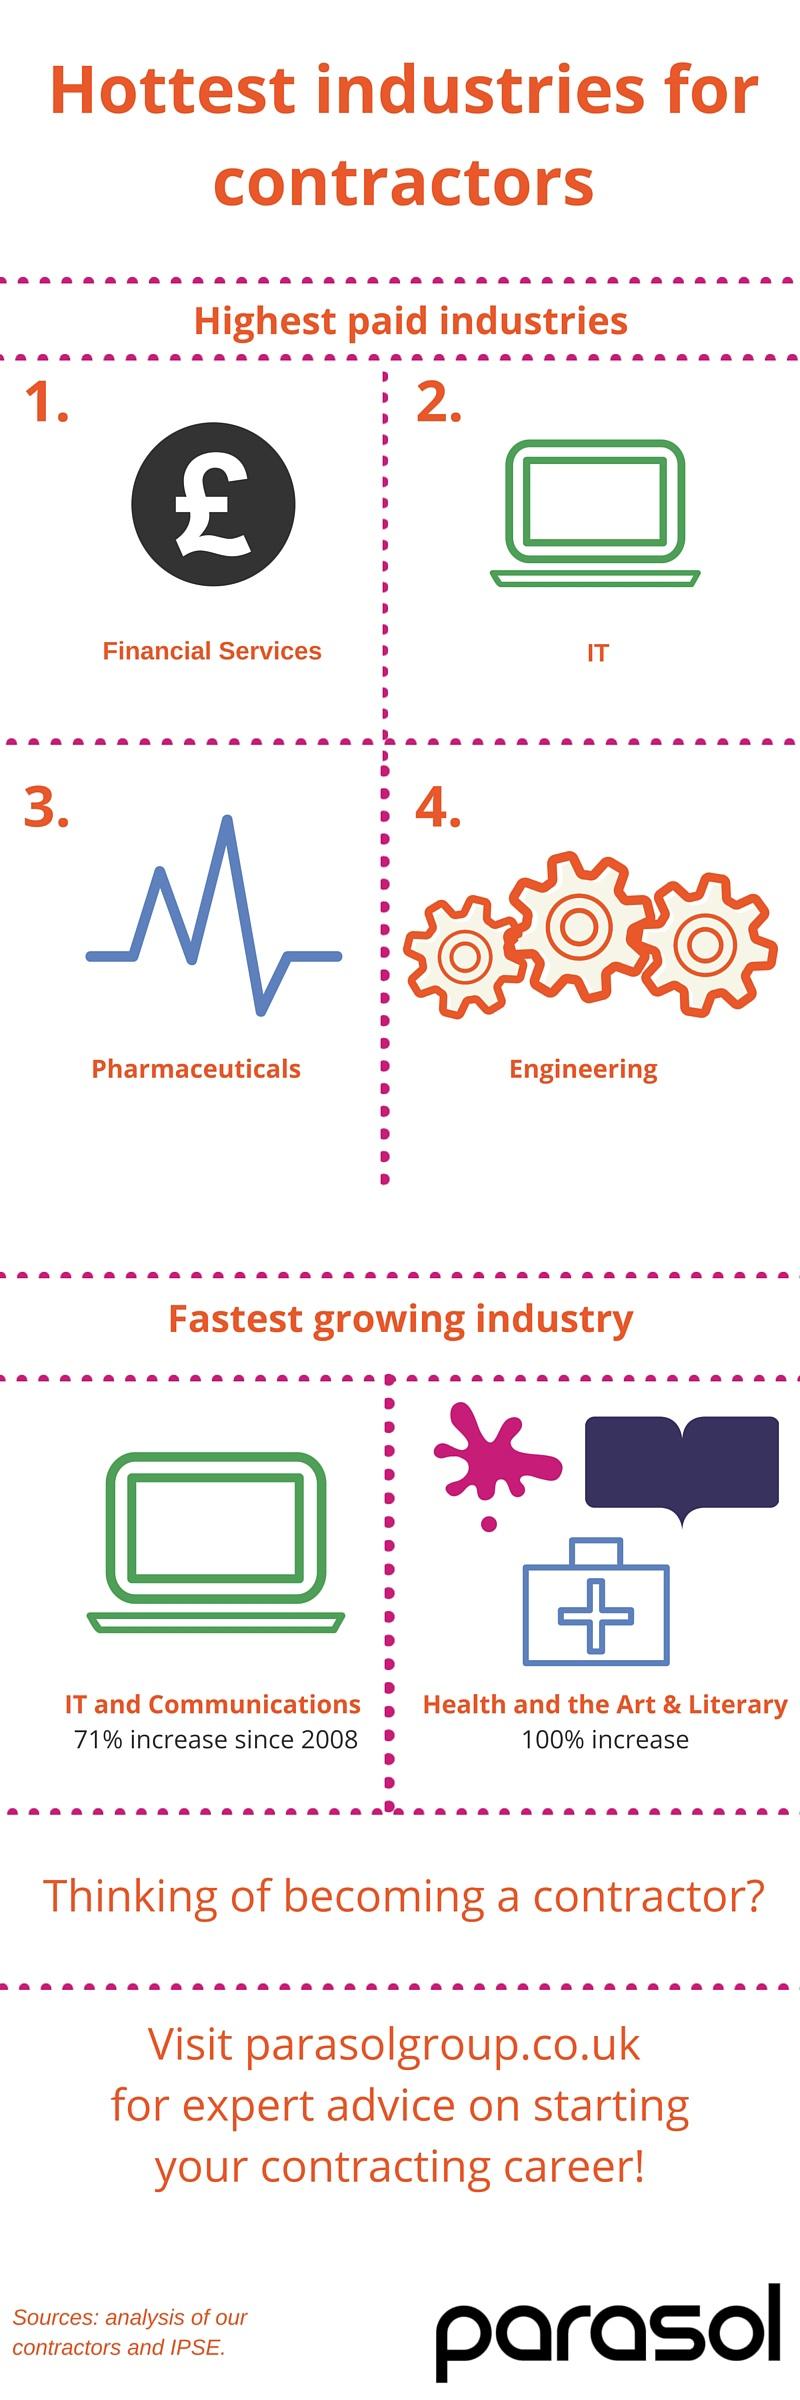 Hottest industries merged